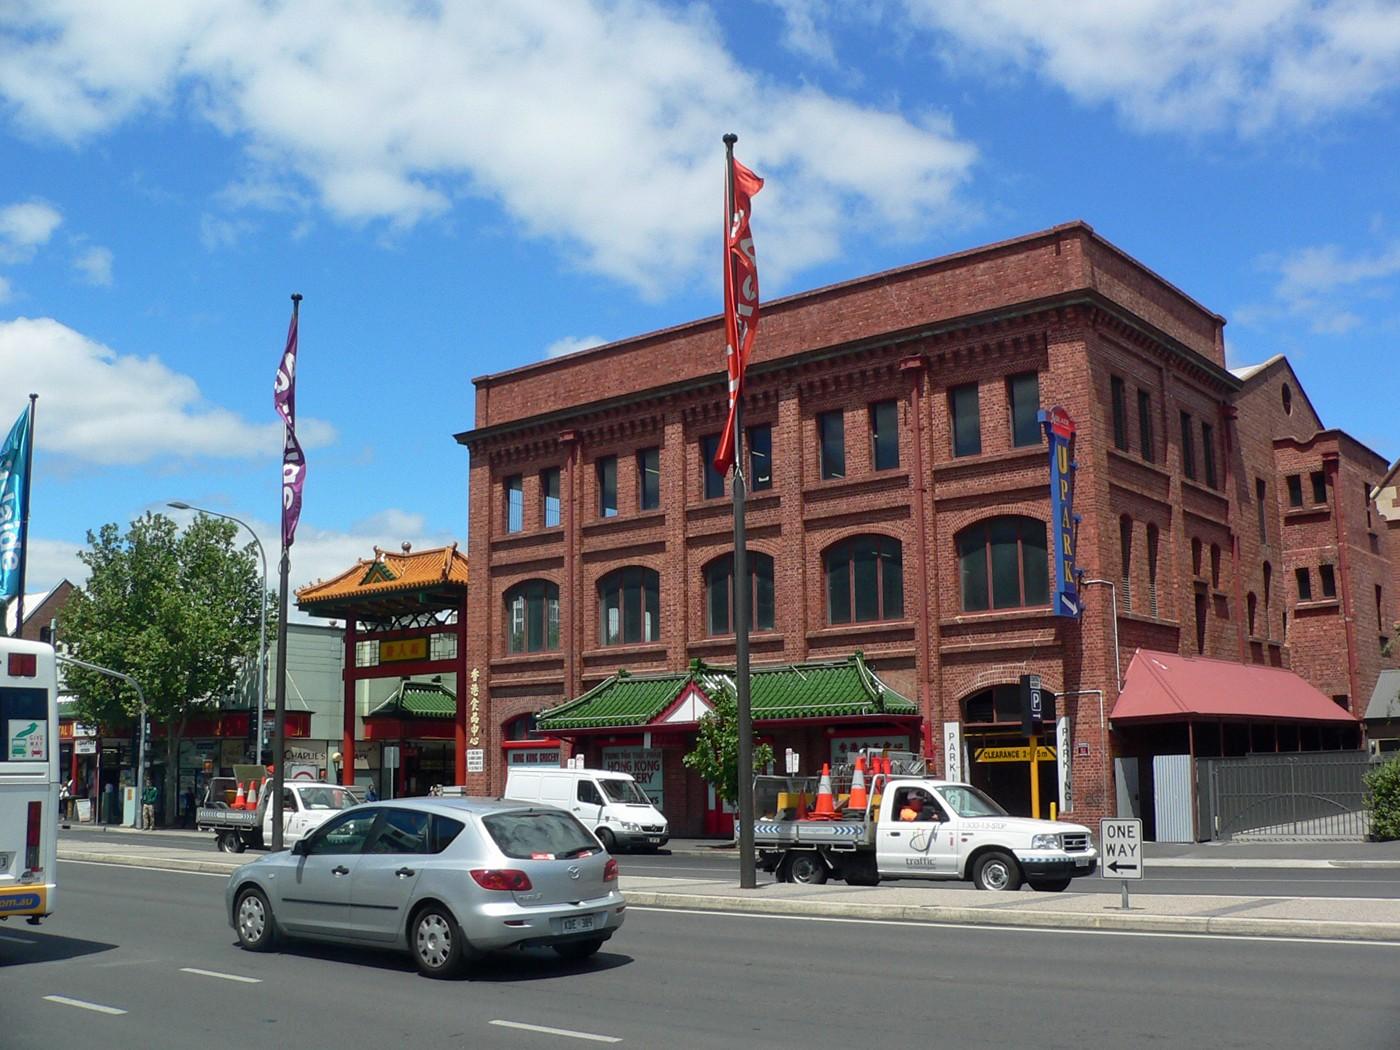 Adelaide, ingresso di Chinatown